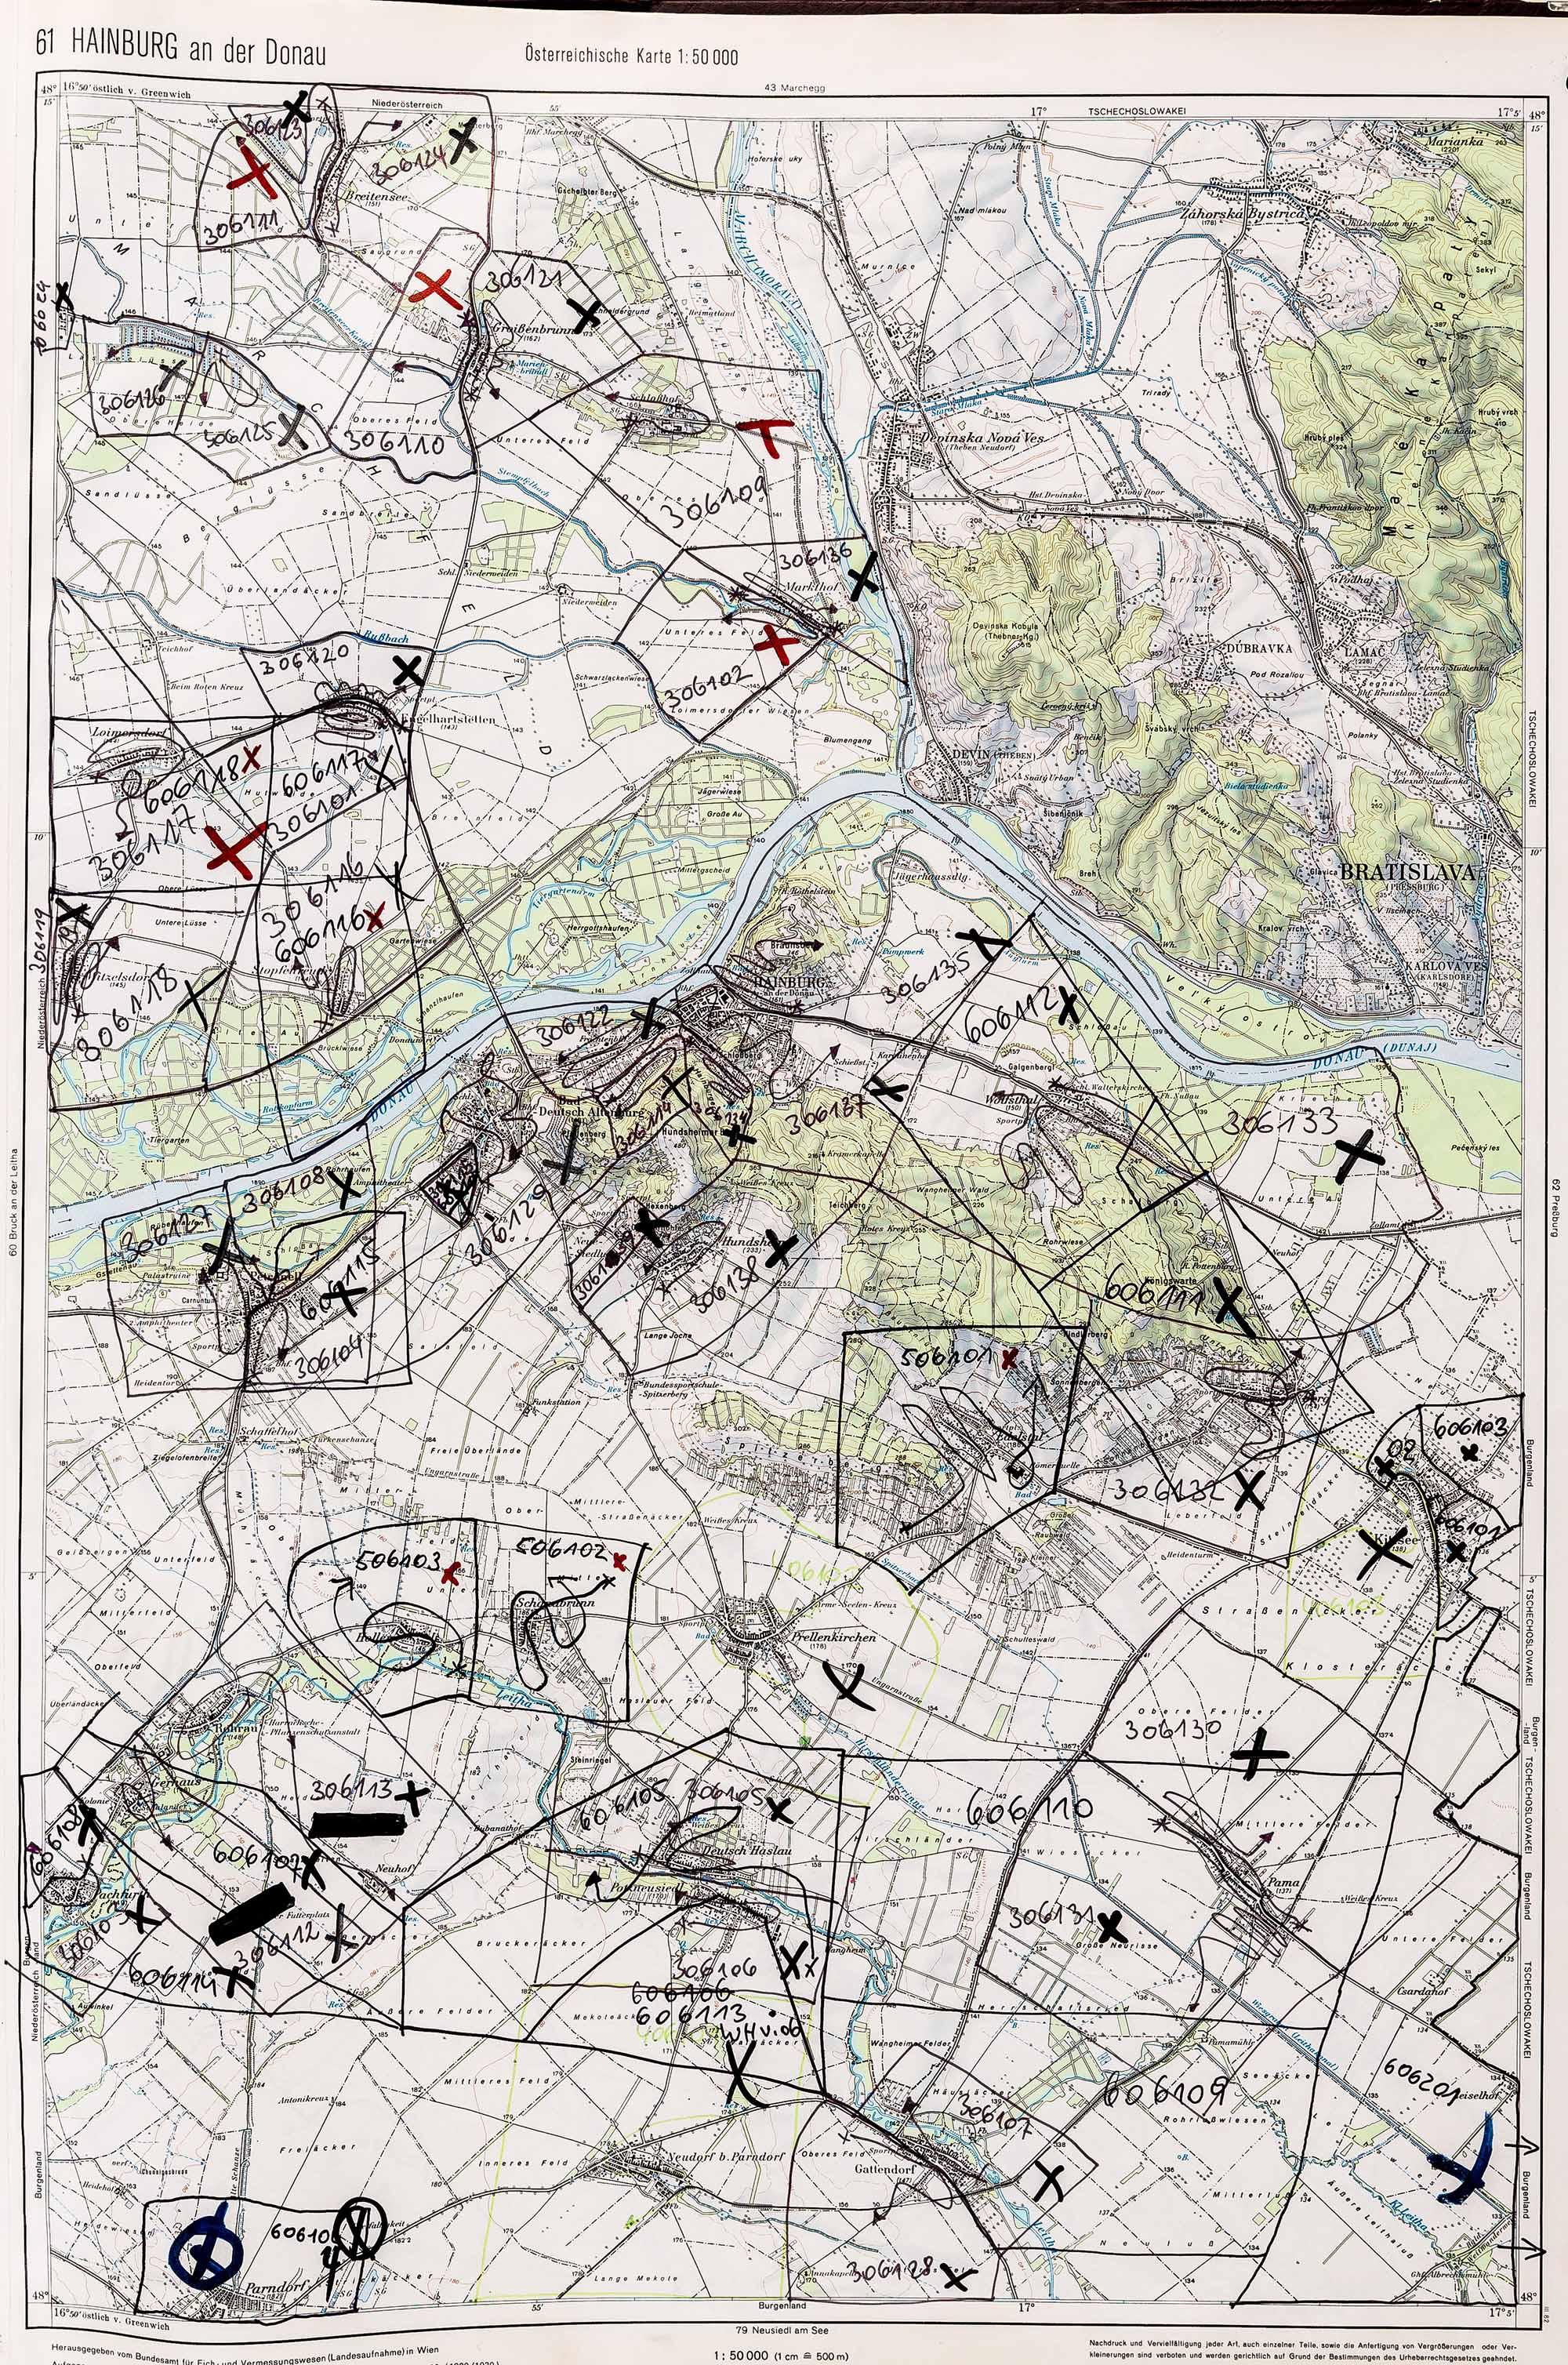 1983-1986 Karte 061